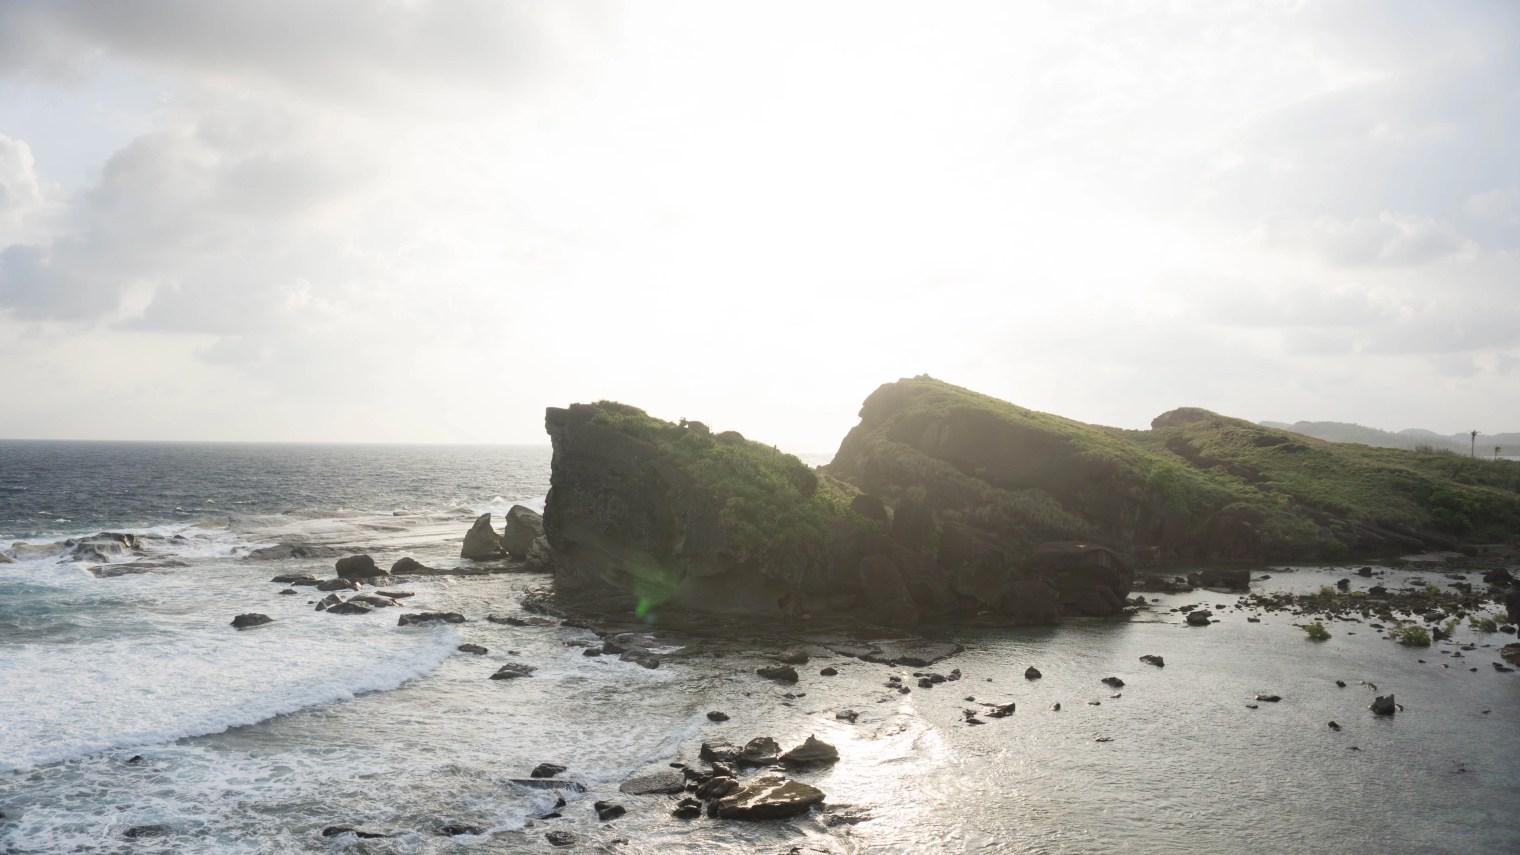 Biri Island Rock Formations - Biri Island - Northern Samar